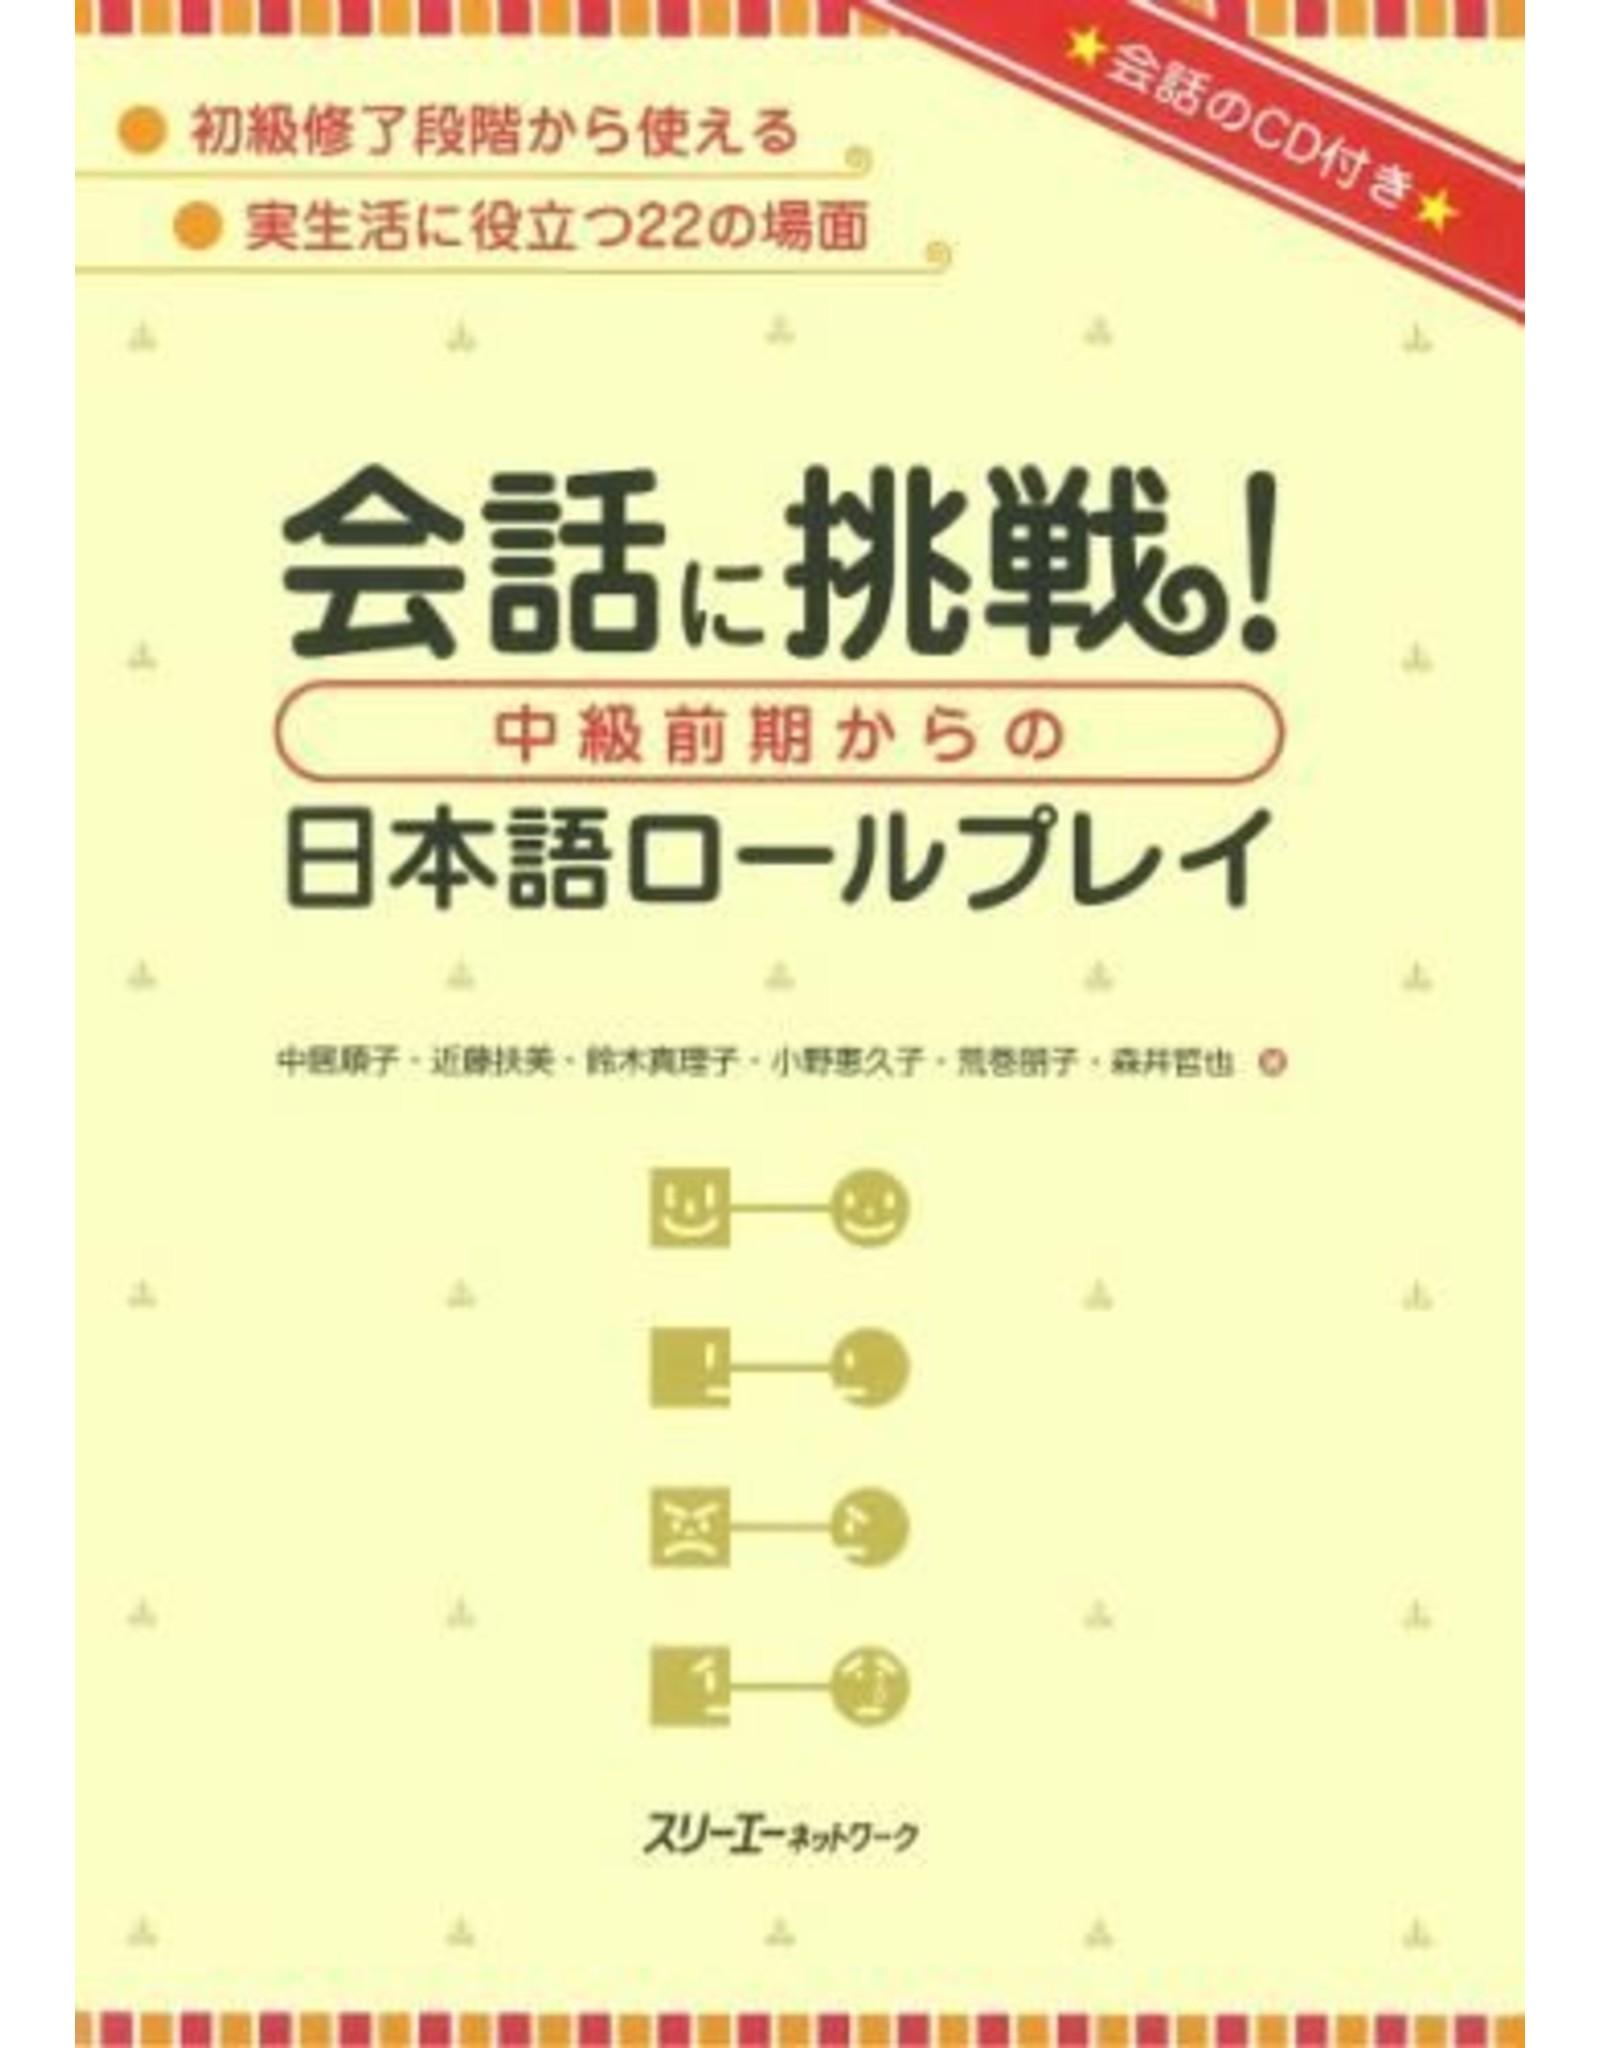 3A Corporation KAIWA NI CHOSEN NIHONGO ROLE-PLAY W/CD